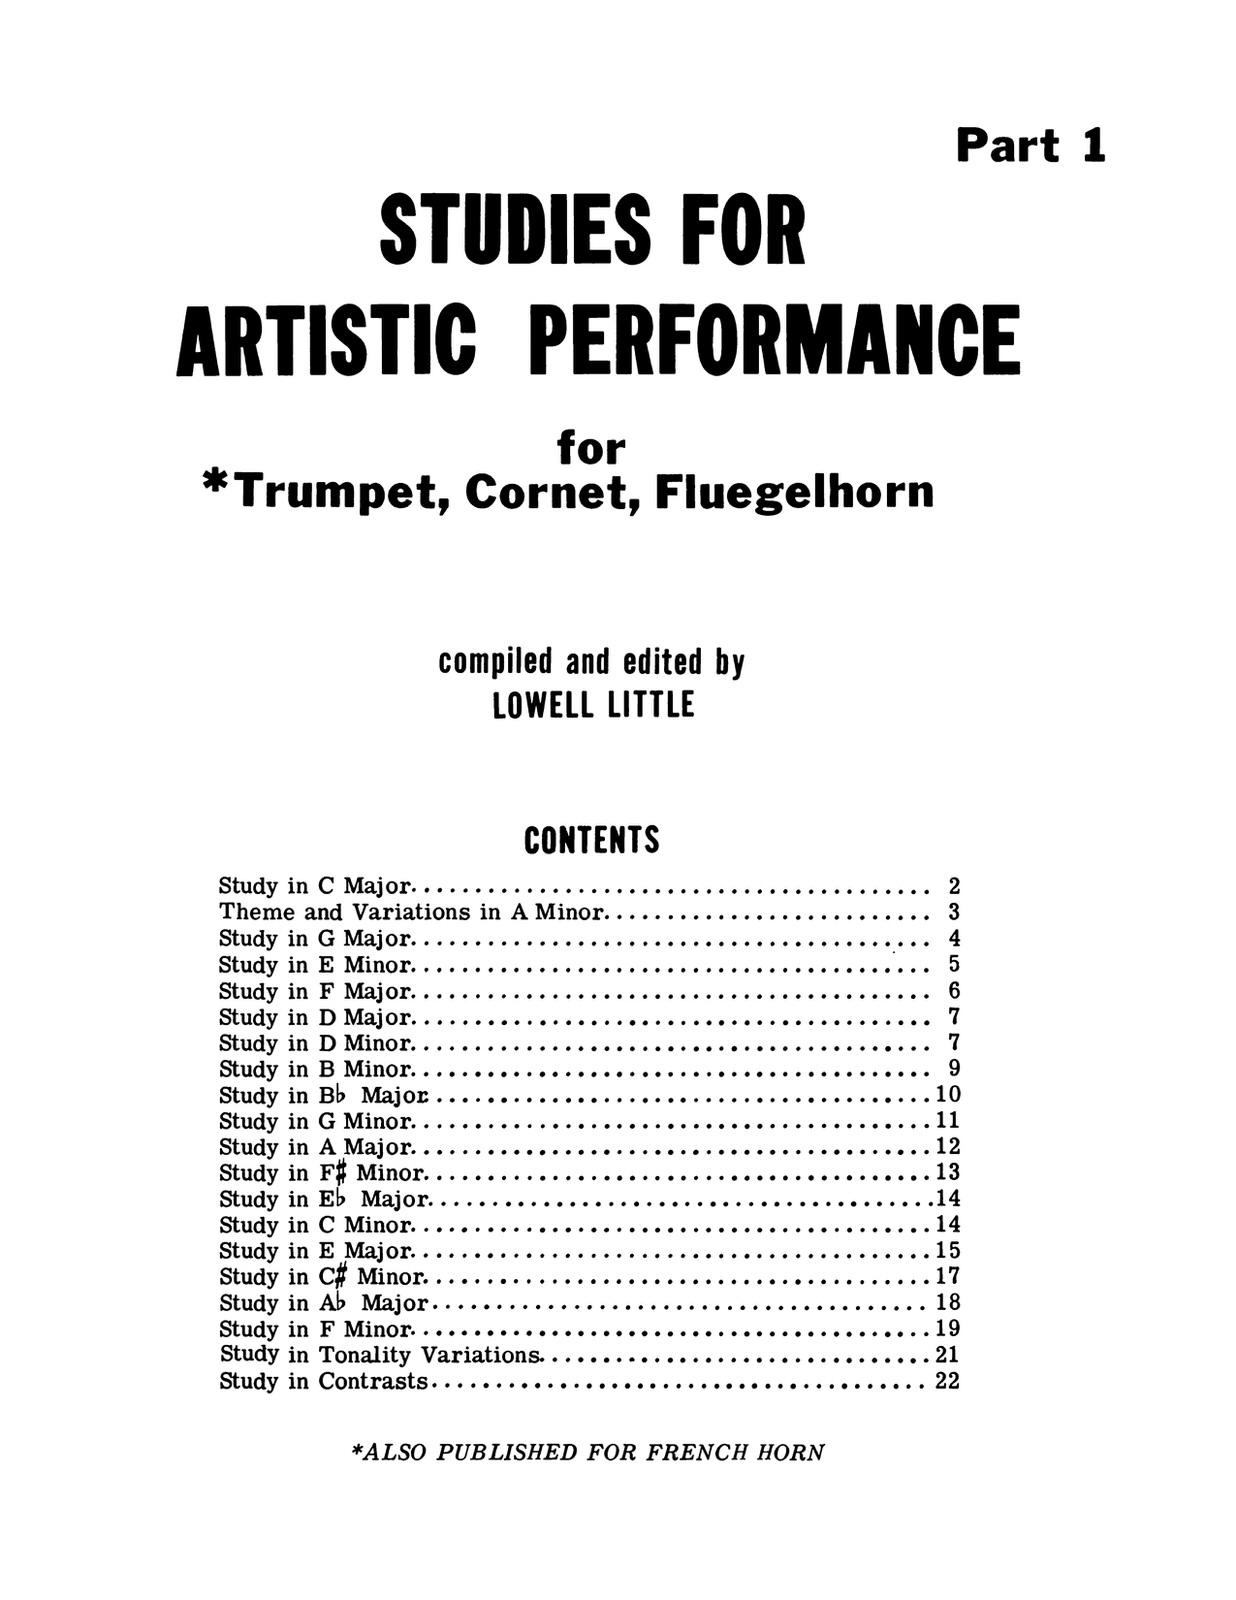 Little, Studies in Artistic Performance Volumes 1 & 2-p05